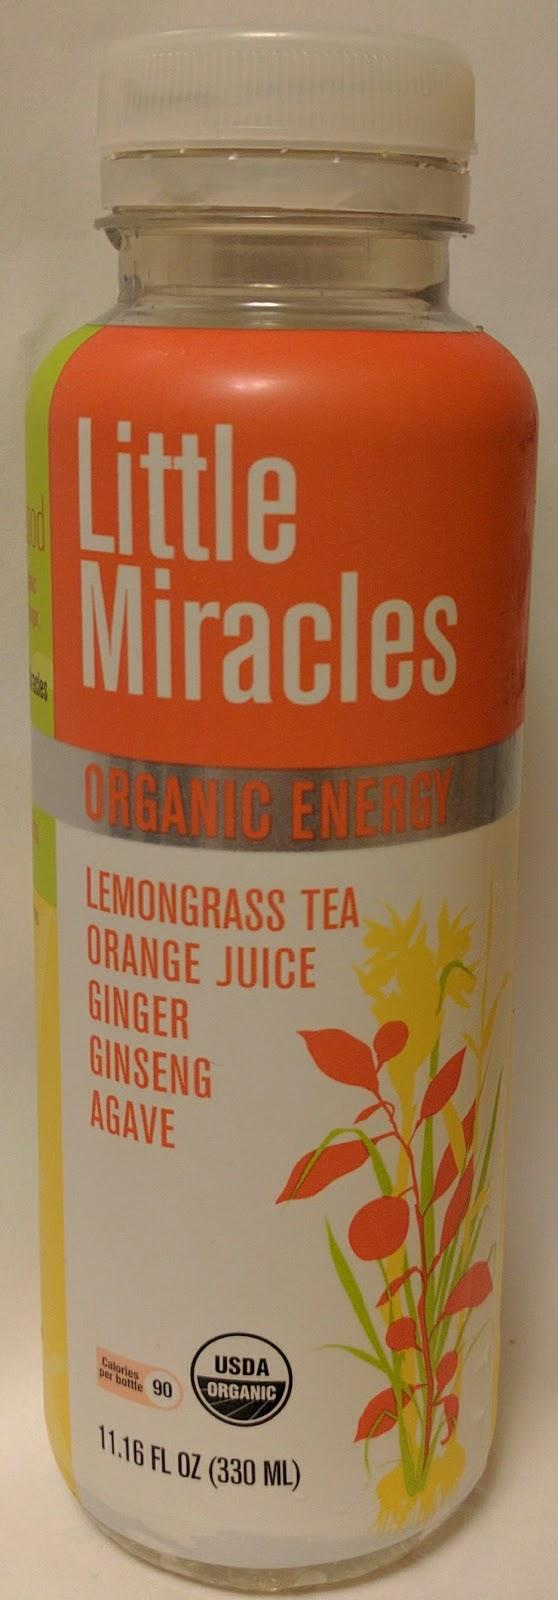 Does lemongrass tea have caffeine